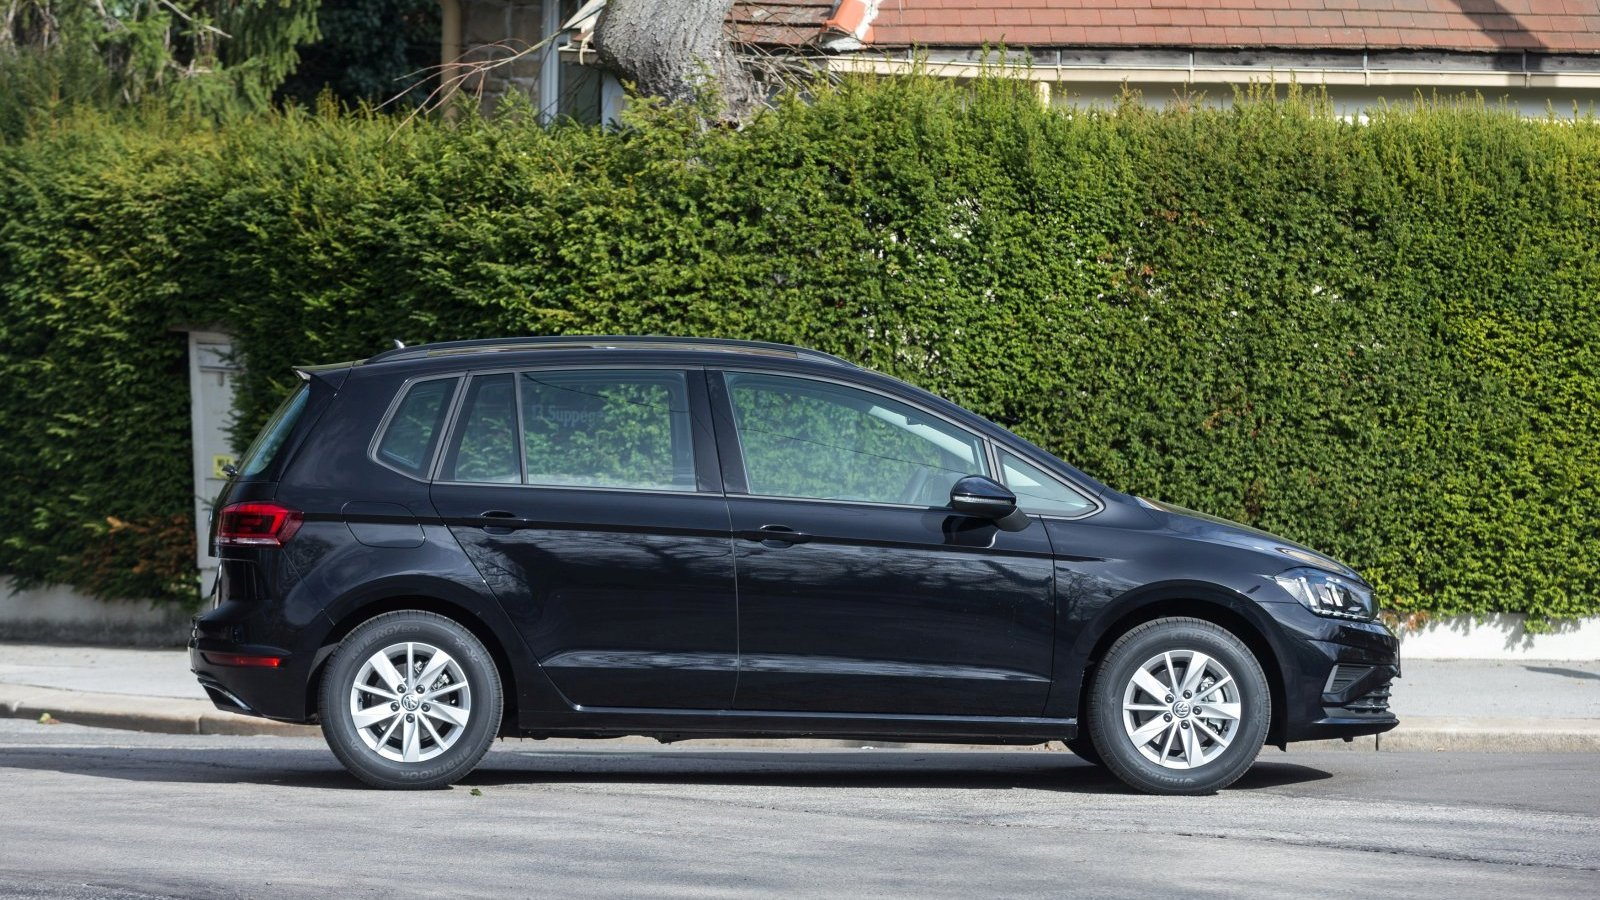 test vw golf sportsvan comfortline 1 6 tdi alles auto. Black Bedroom Furniture Sets. Home Design Ideas